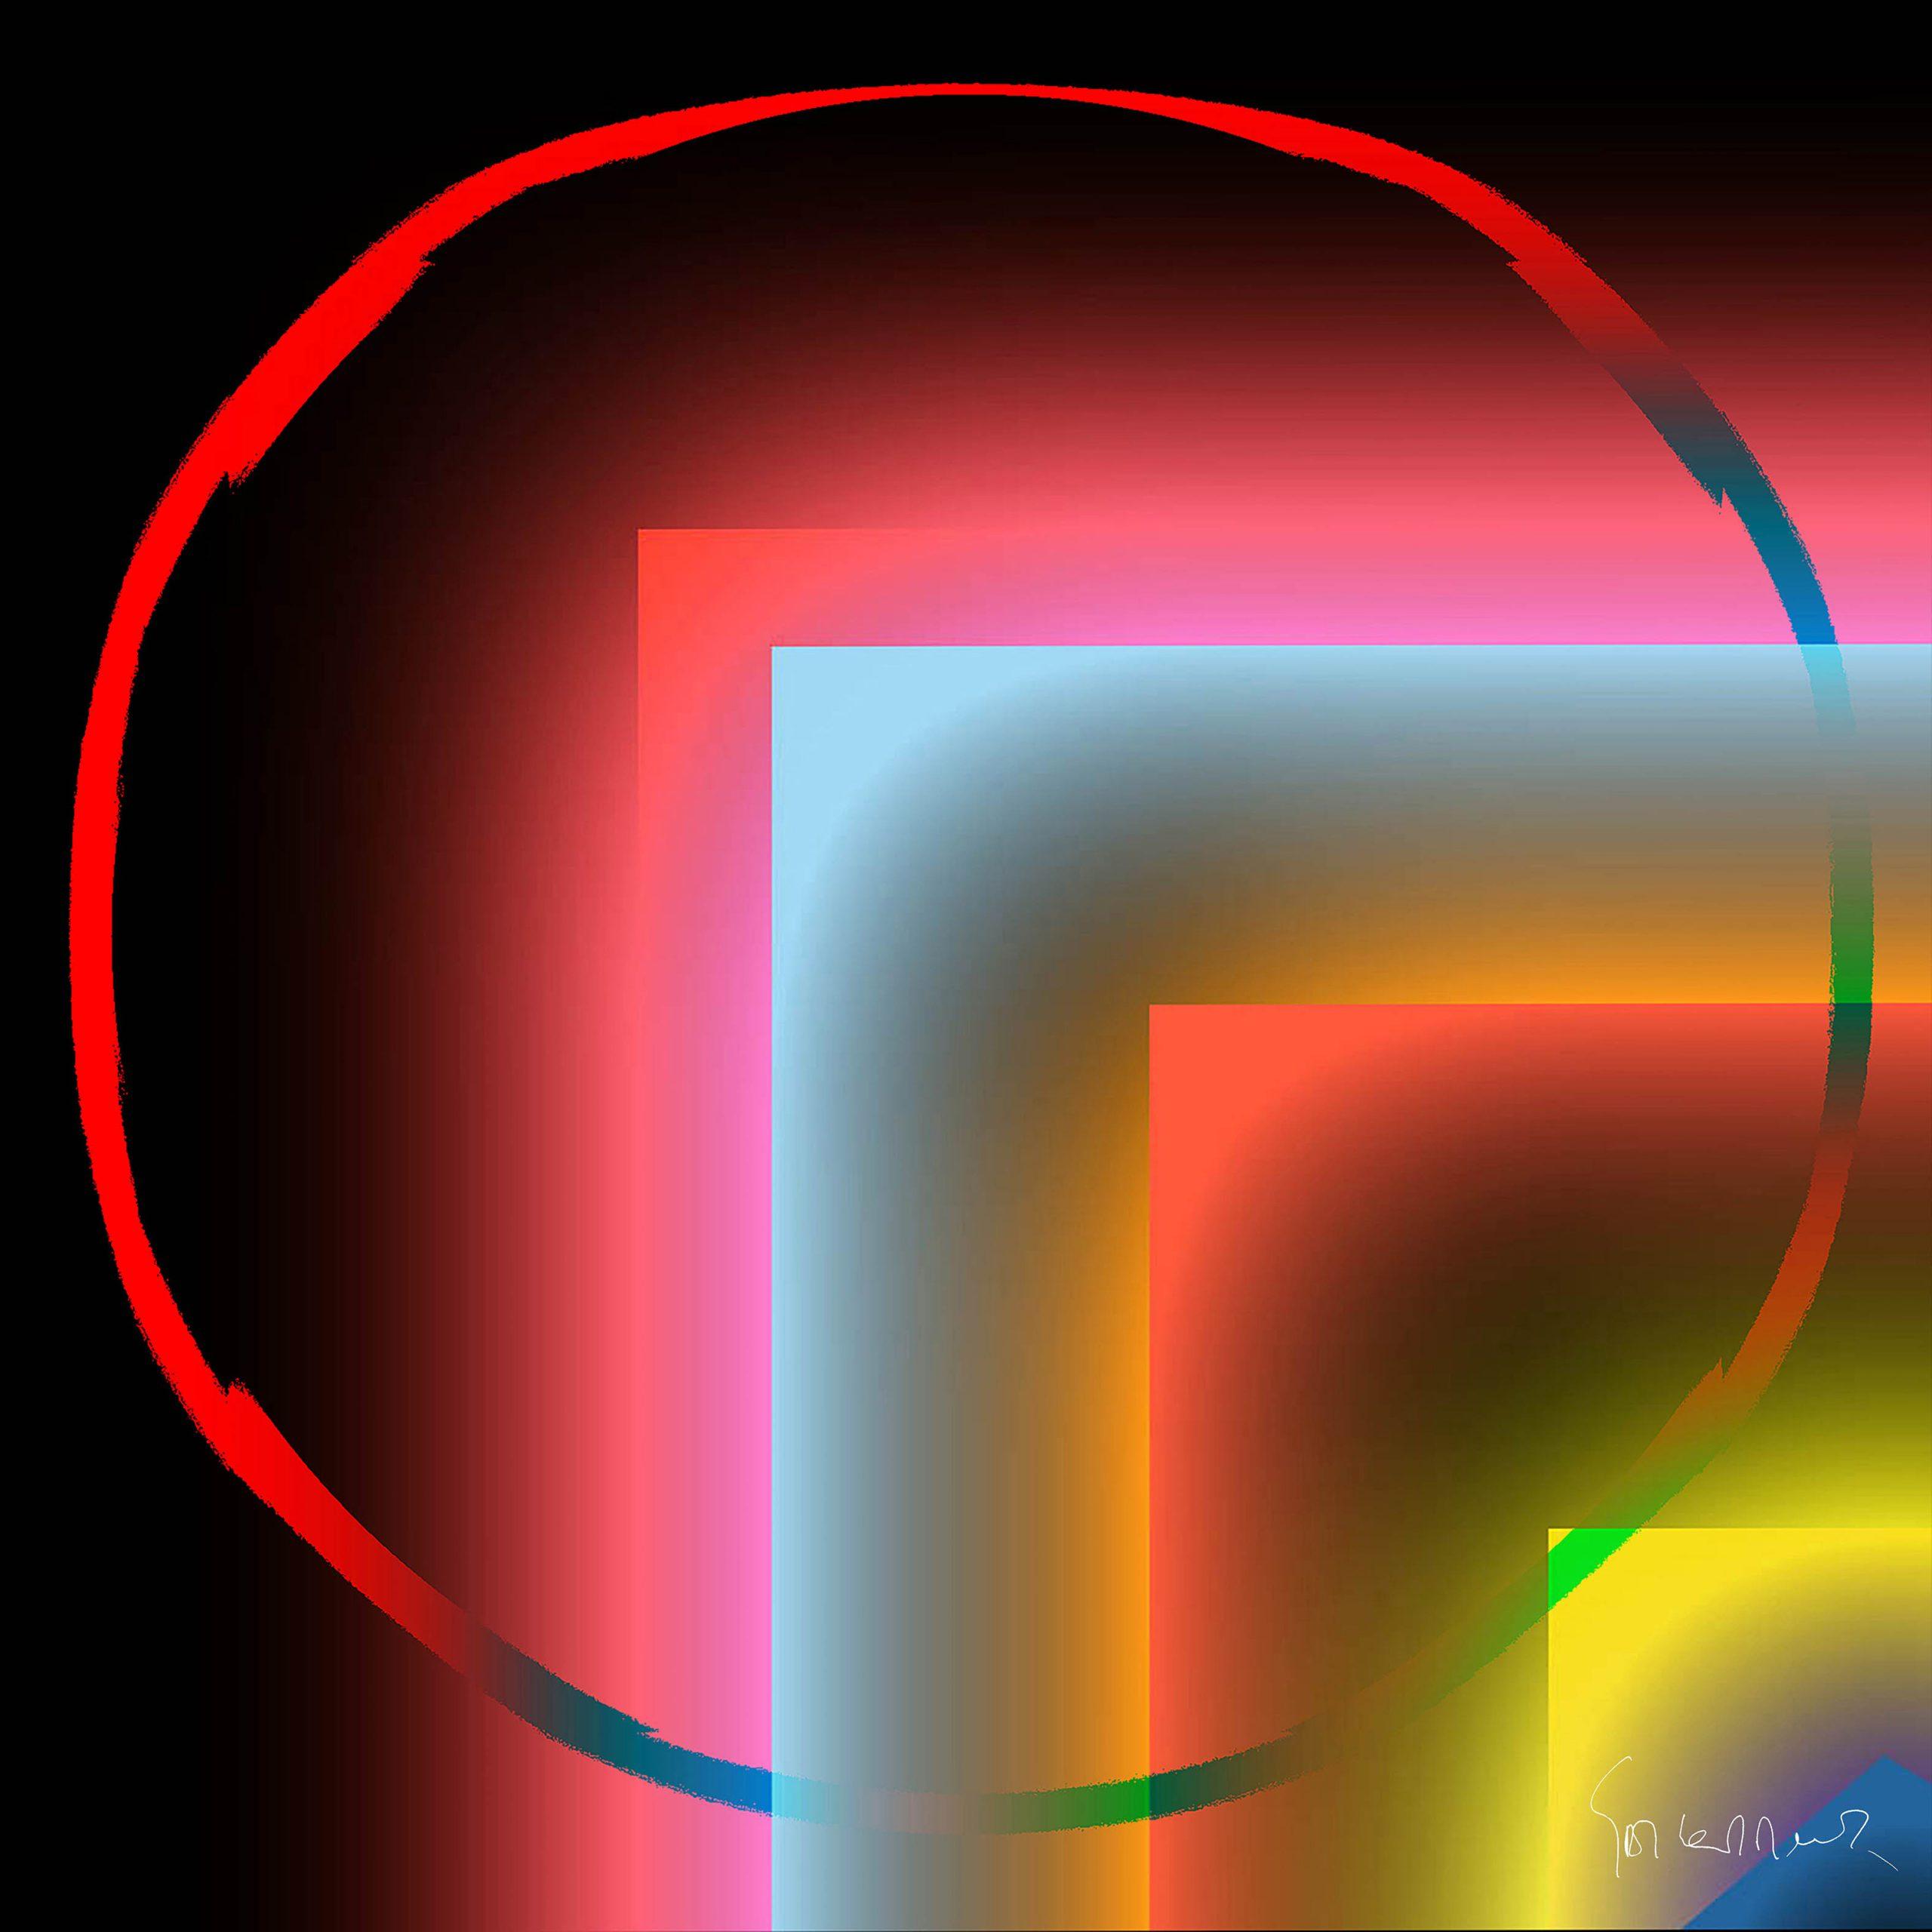 Kunst: Glowing sensitive existence opus 70 van kunstenaar Geert Lemmers